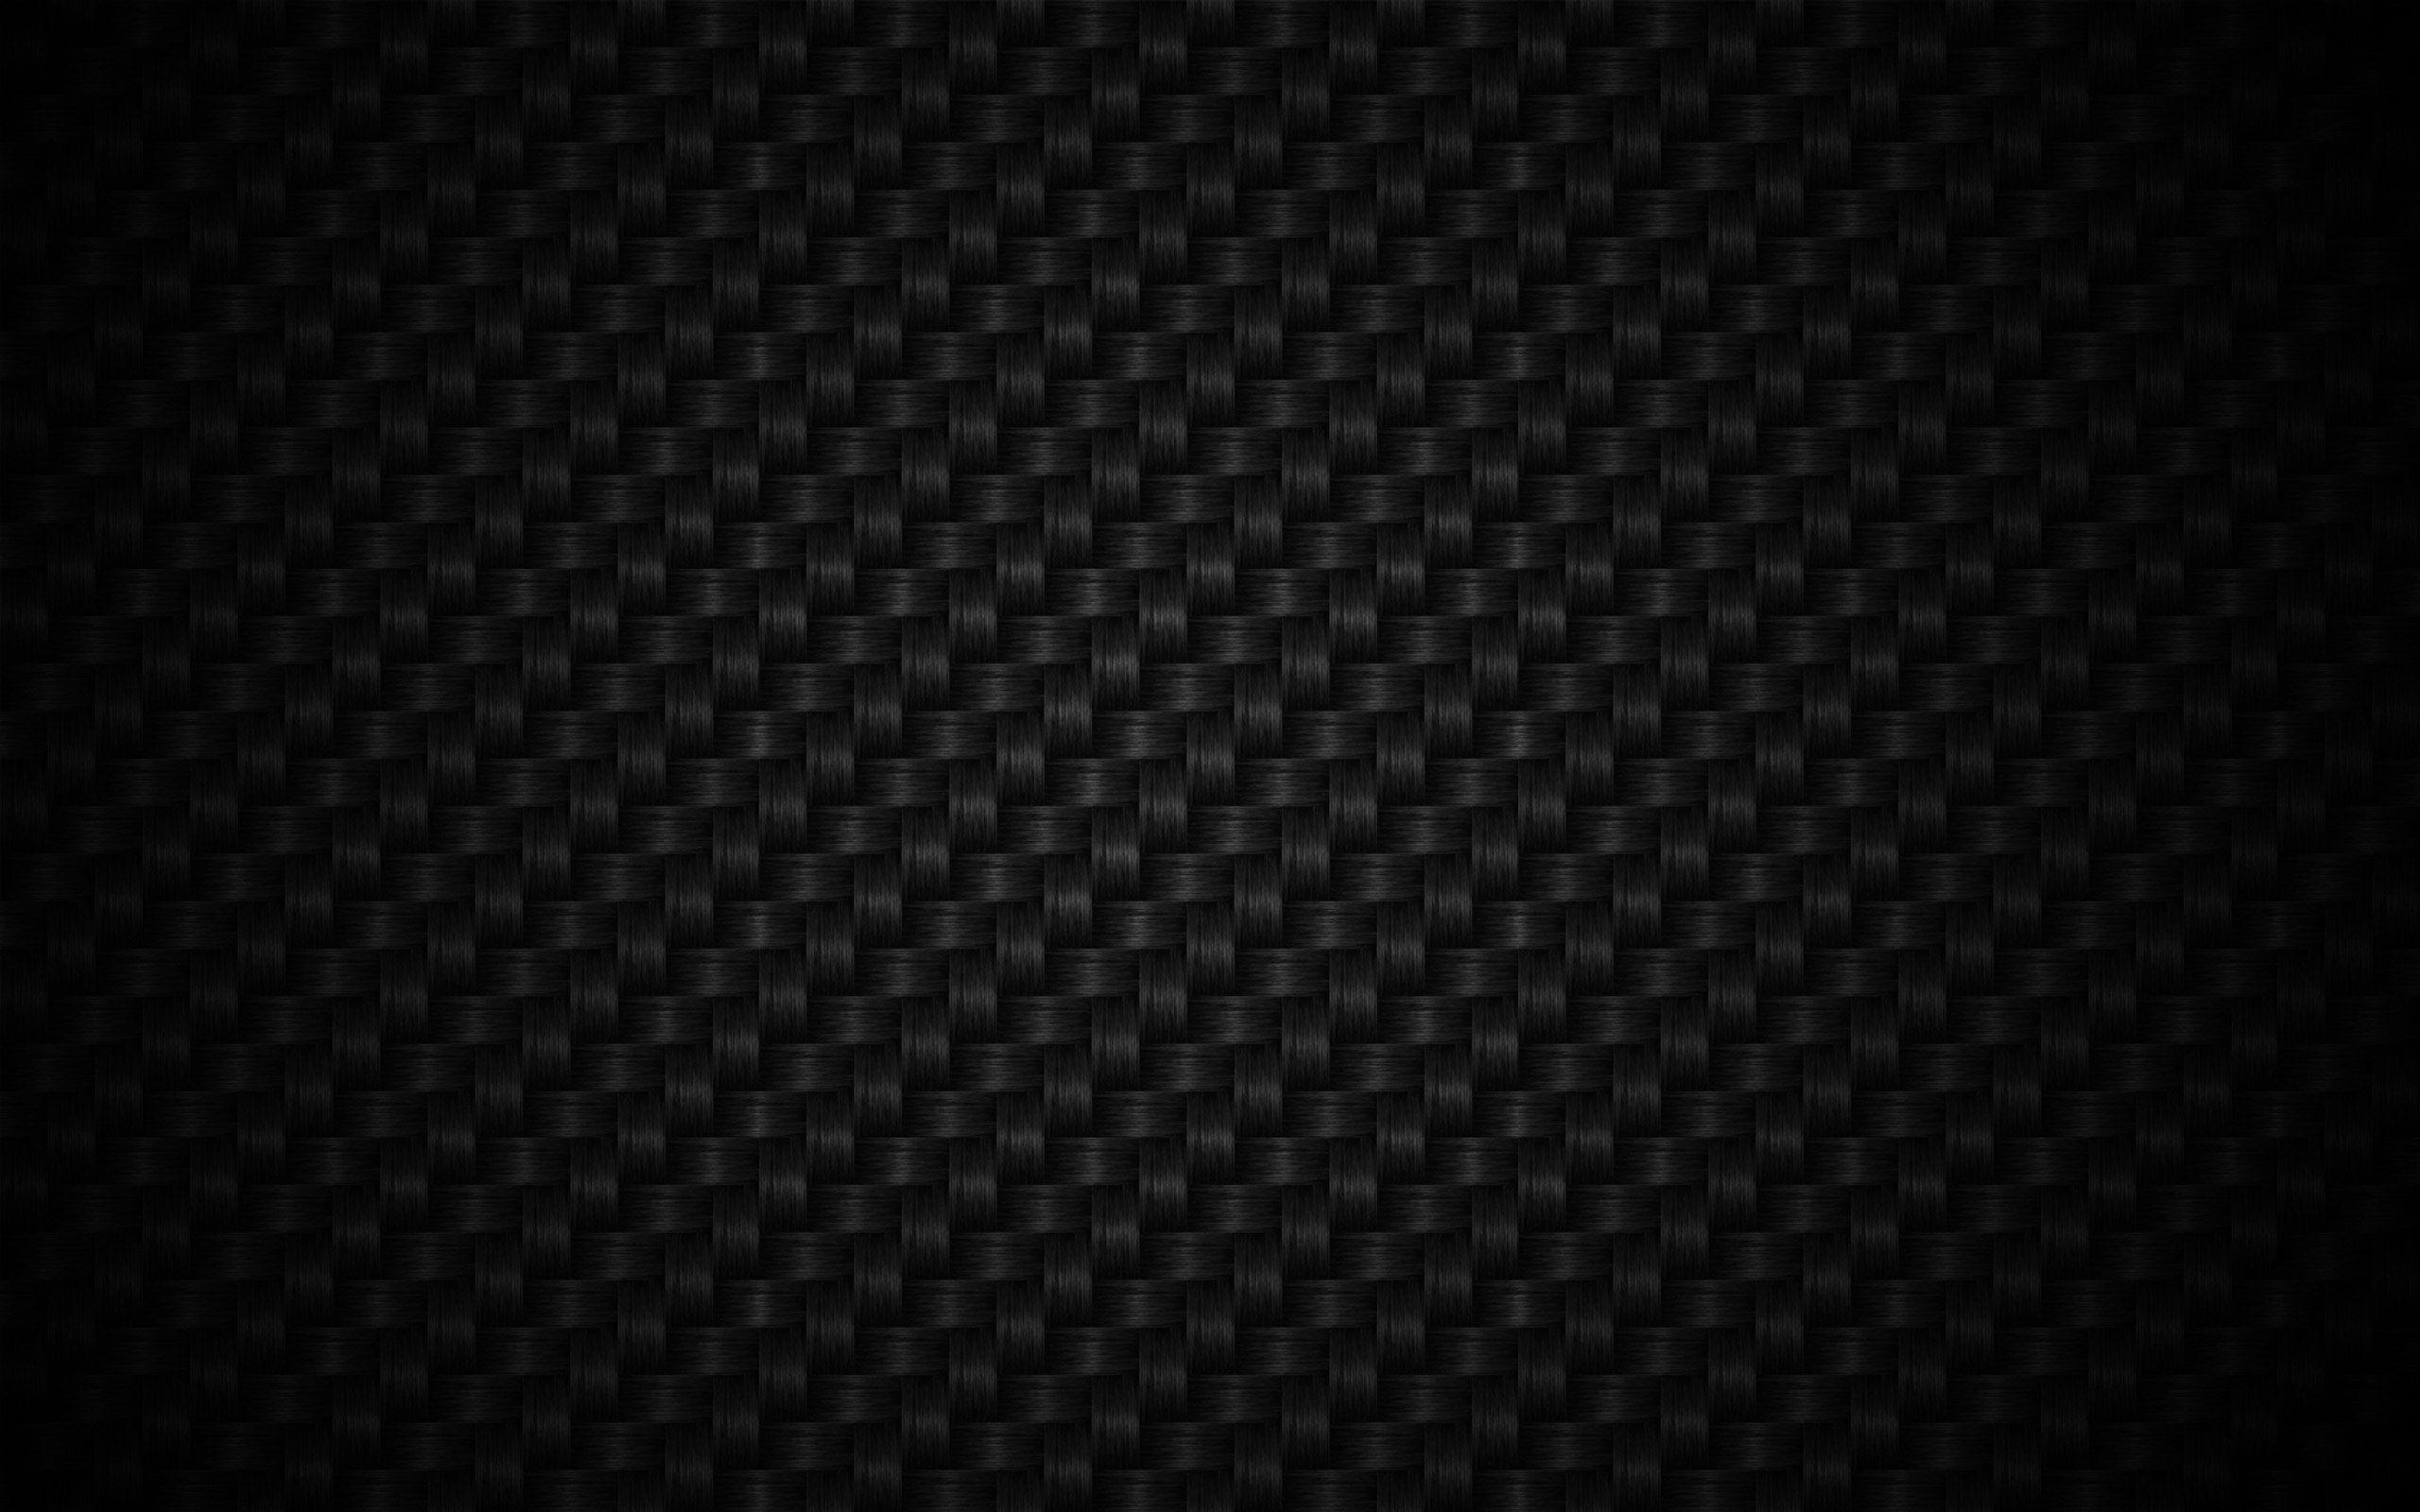 Black Screen Wallpapers - Wallpaper Cave